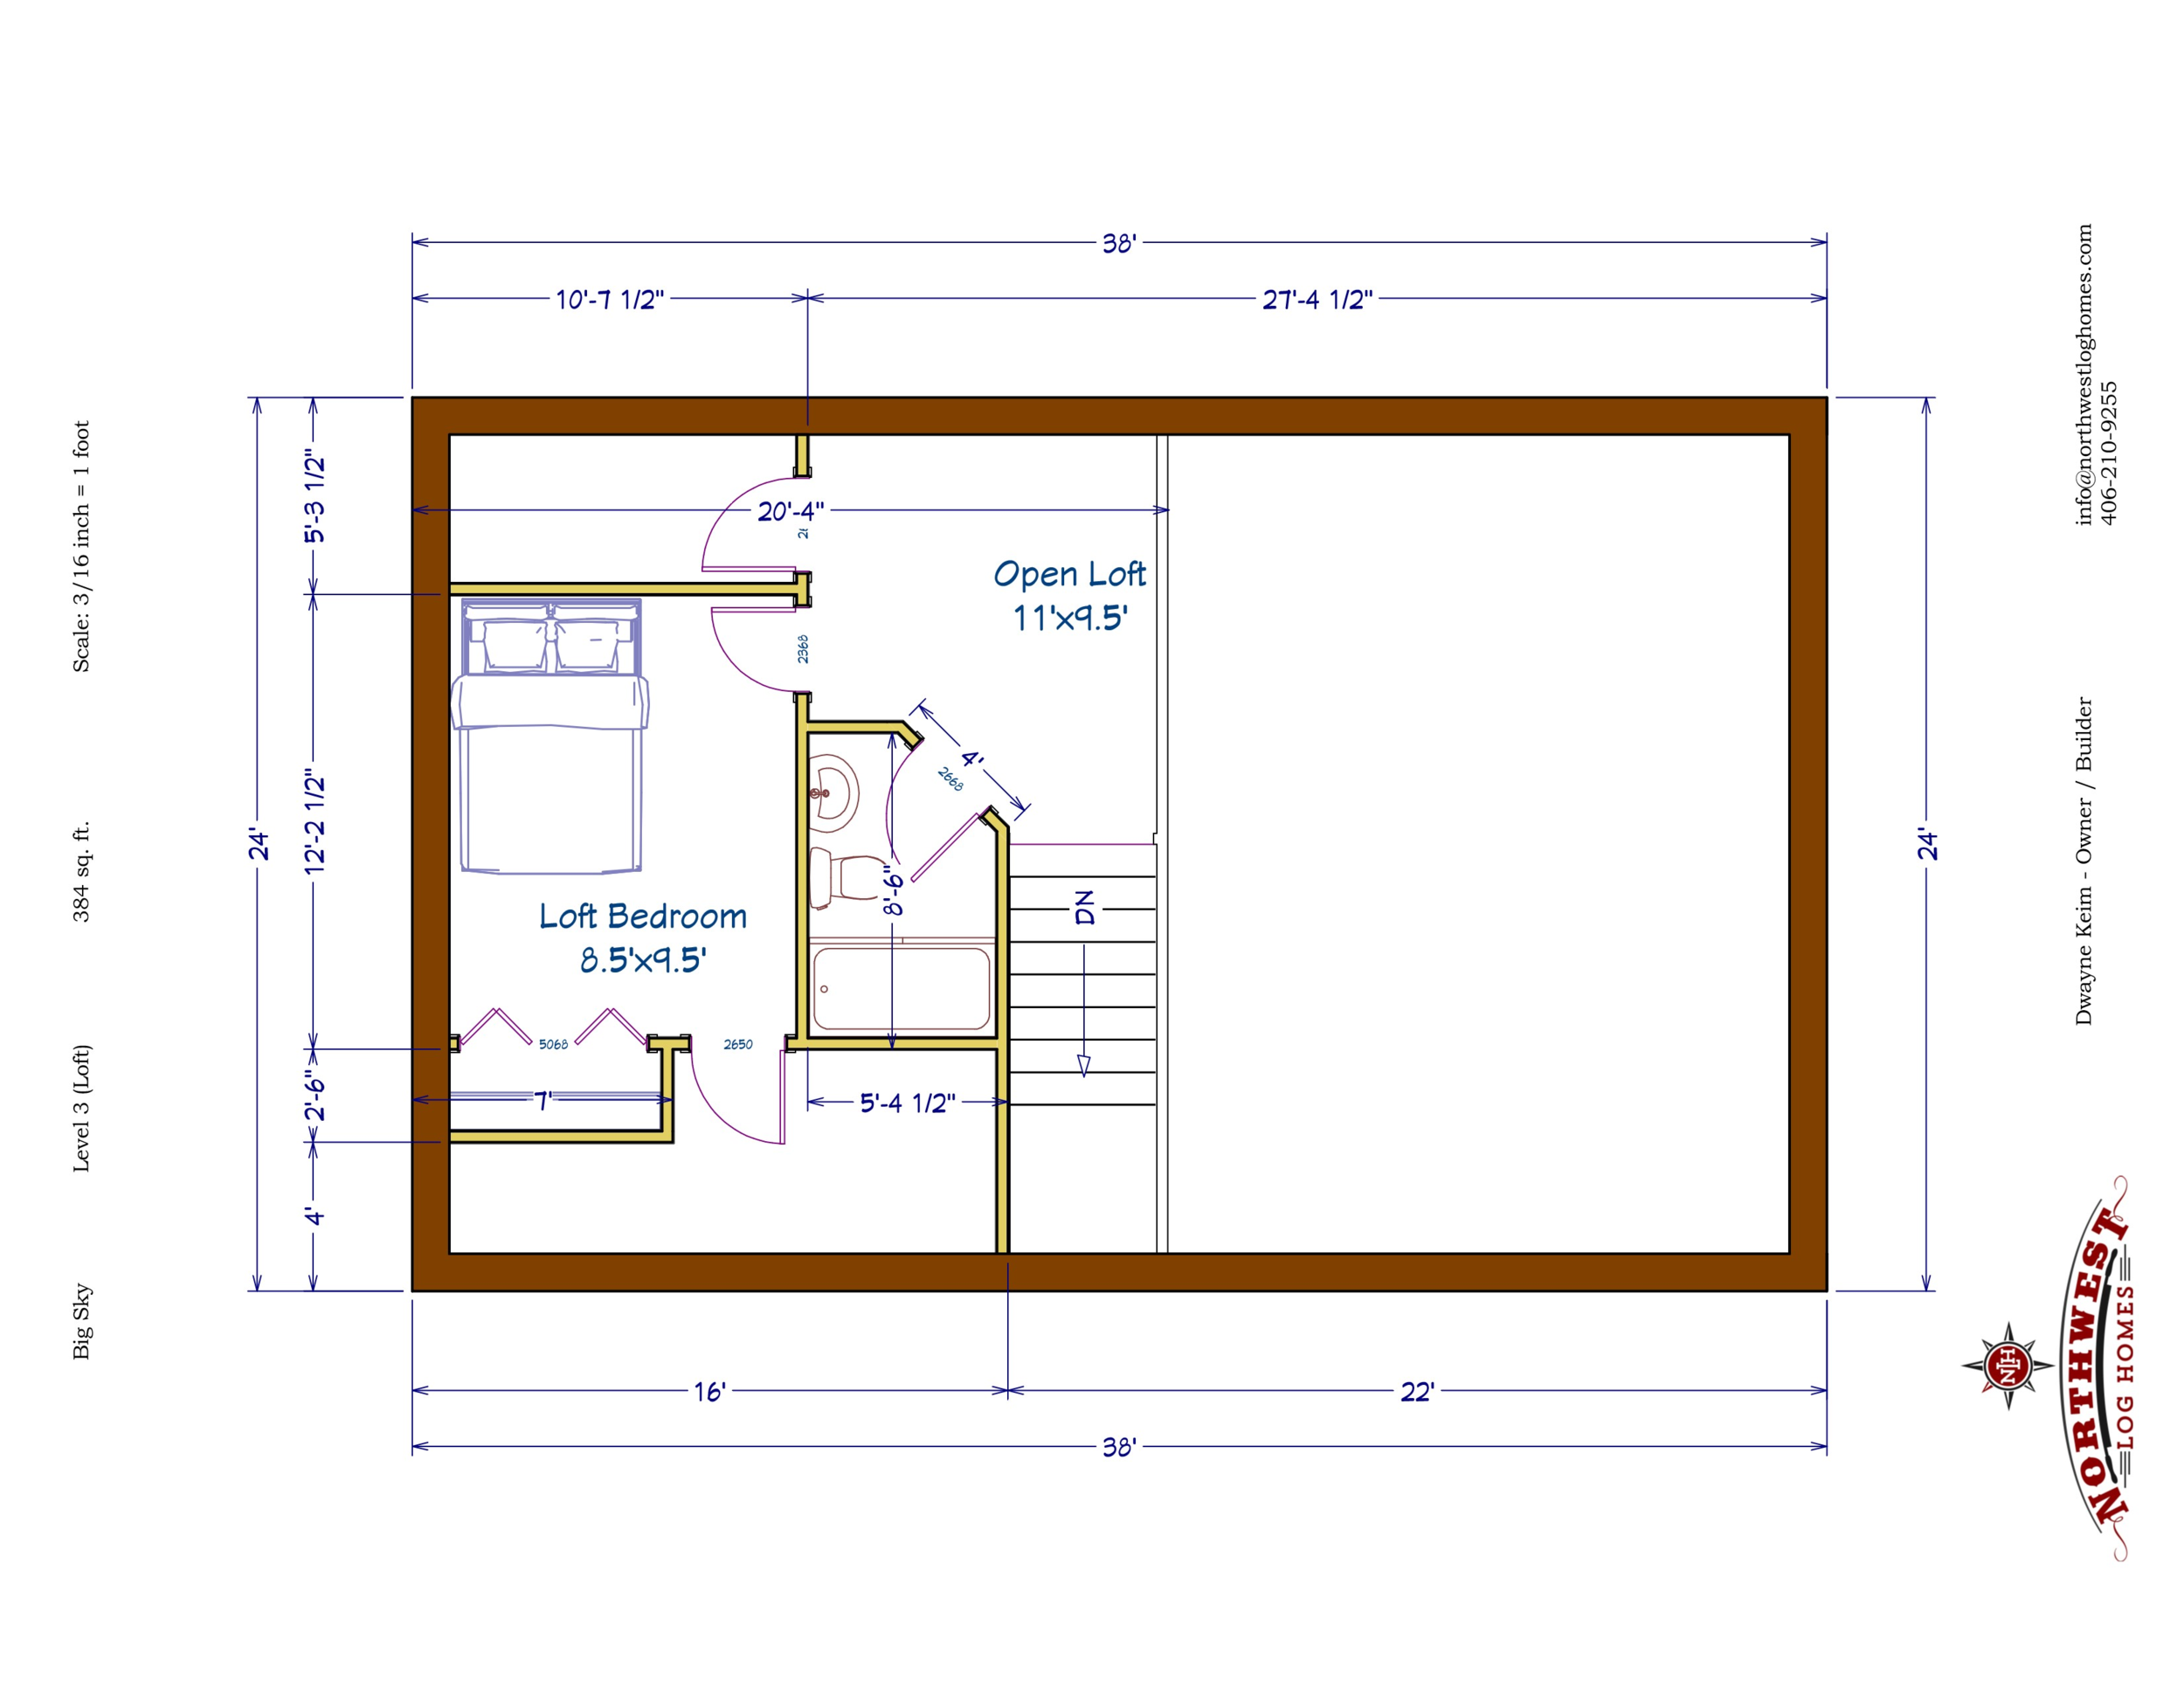 Loft - 384 sq. ft.